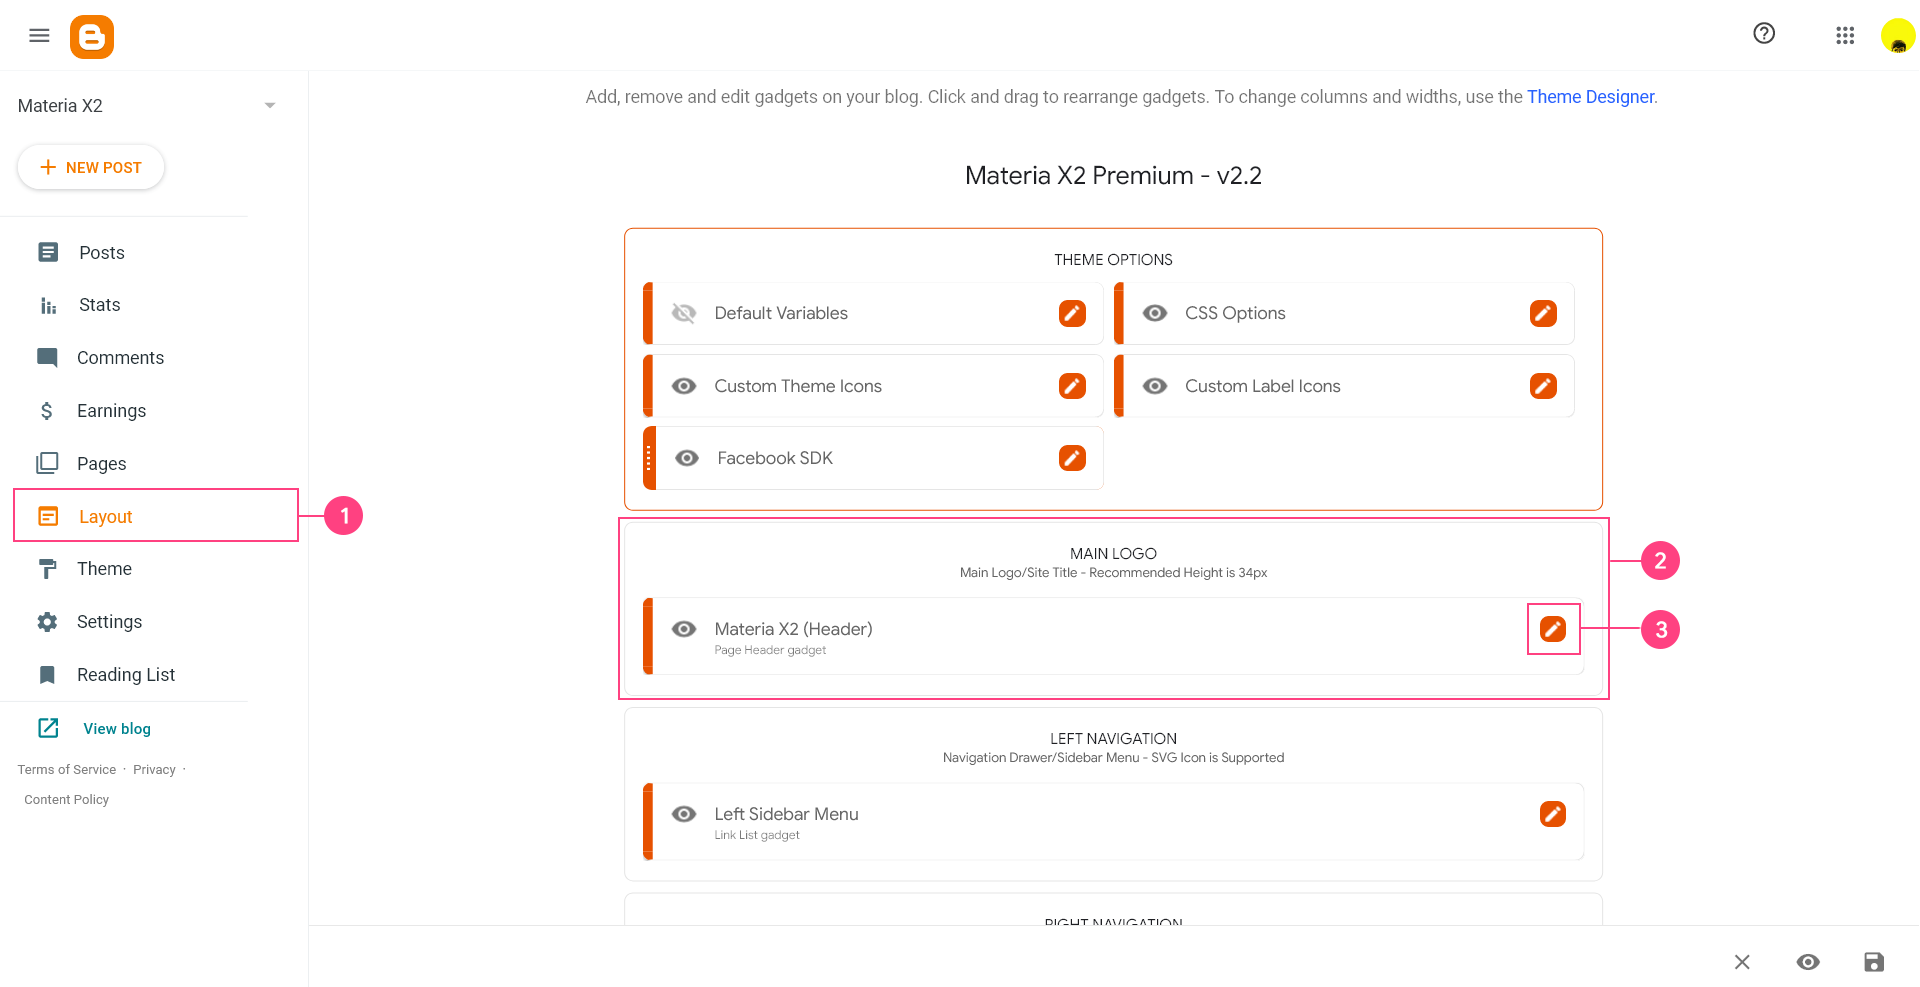 Cara Mengatur Judul dan Logo Blog/Website Template Materia X2